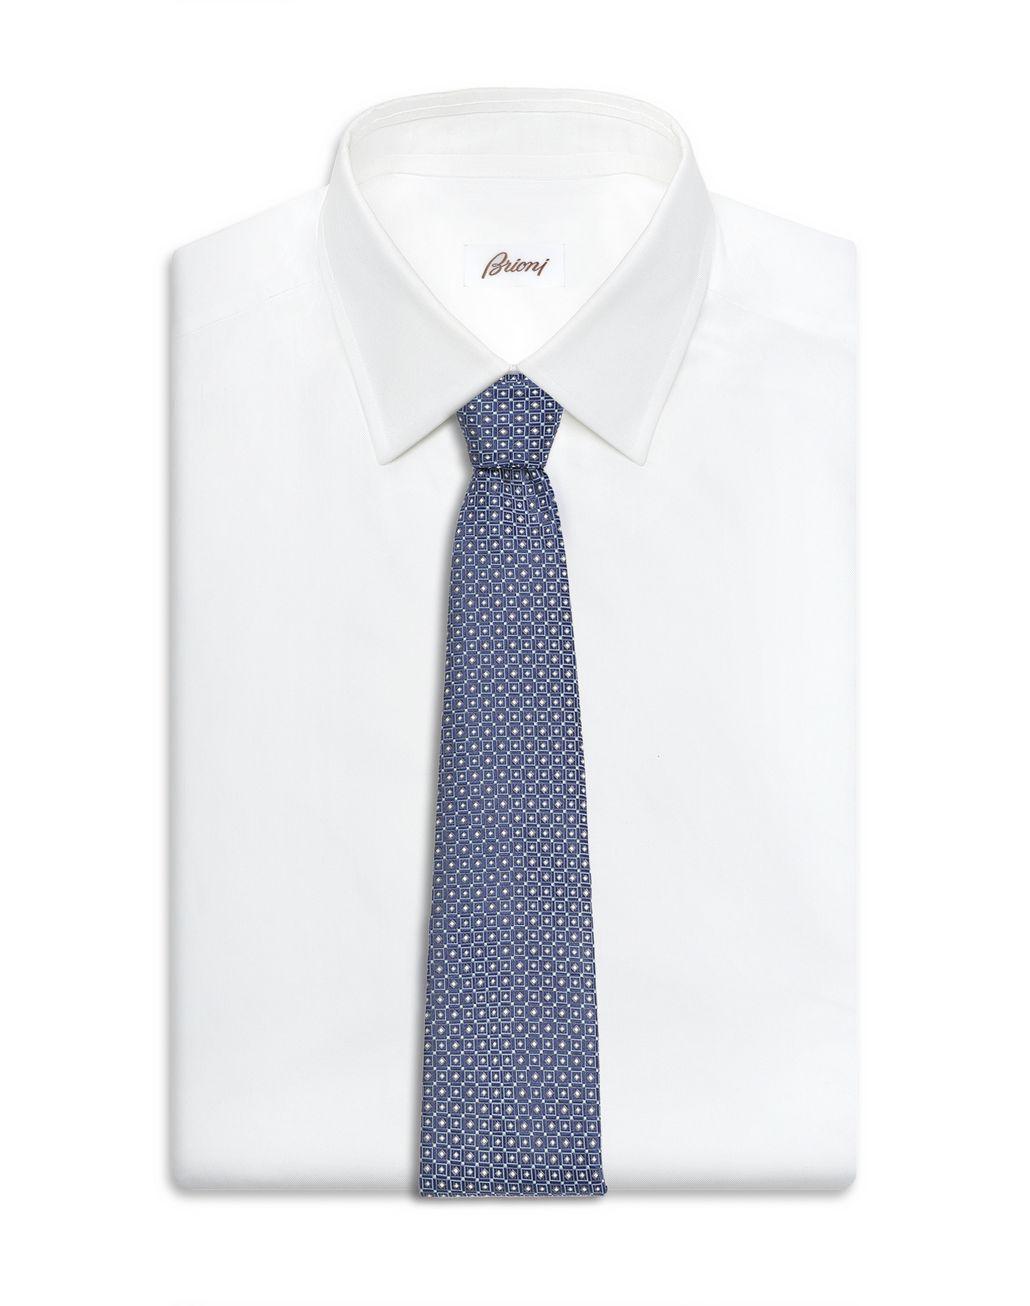 BRIONI Cravate à large motif bleu roi Cravate [*** pickupInStoreShippingNotGuaranteed_info ***] d